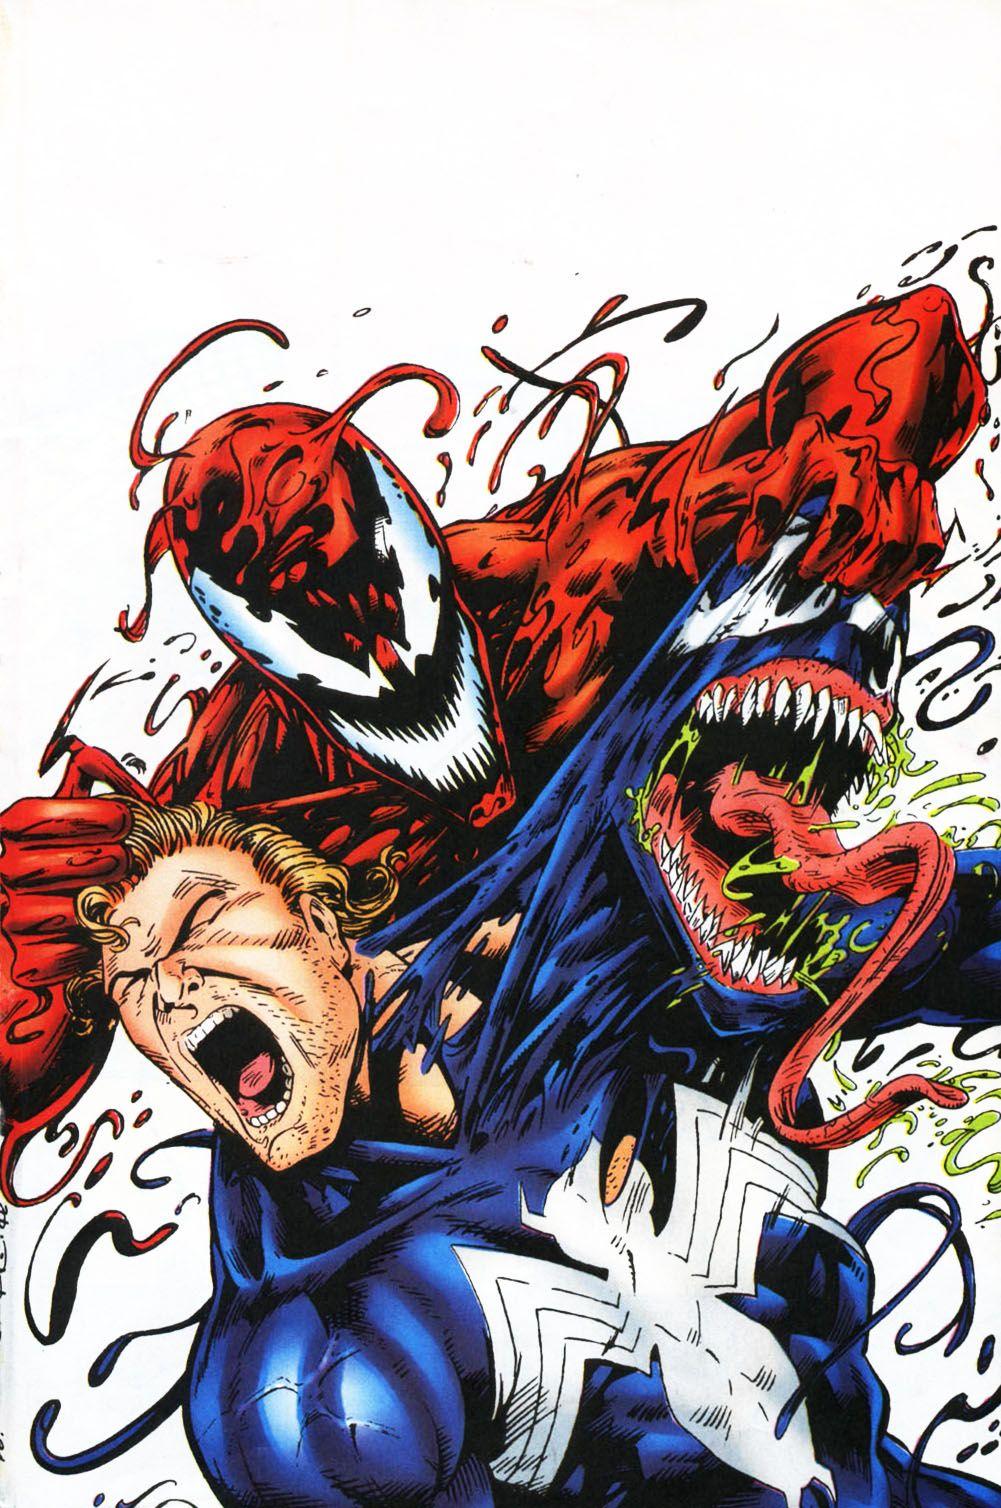 venom carnage unleashed vol 1 3 | nerd | marvel, comics, marvel comics